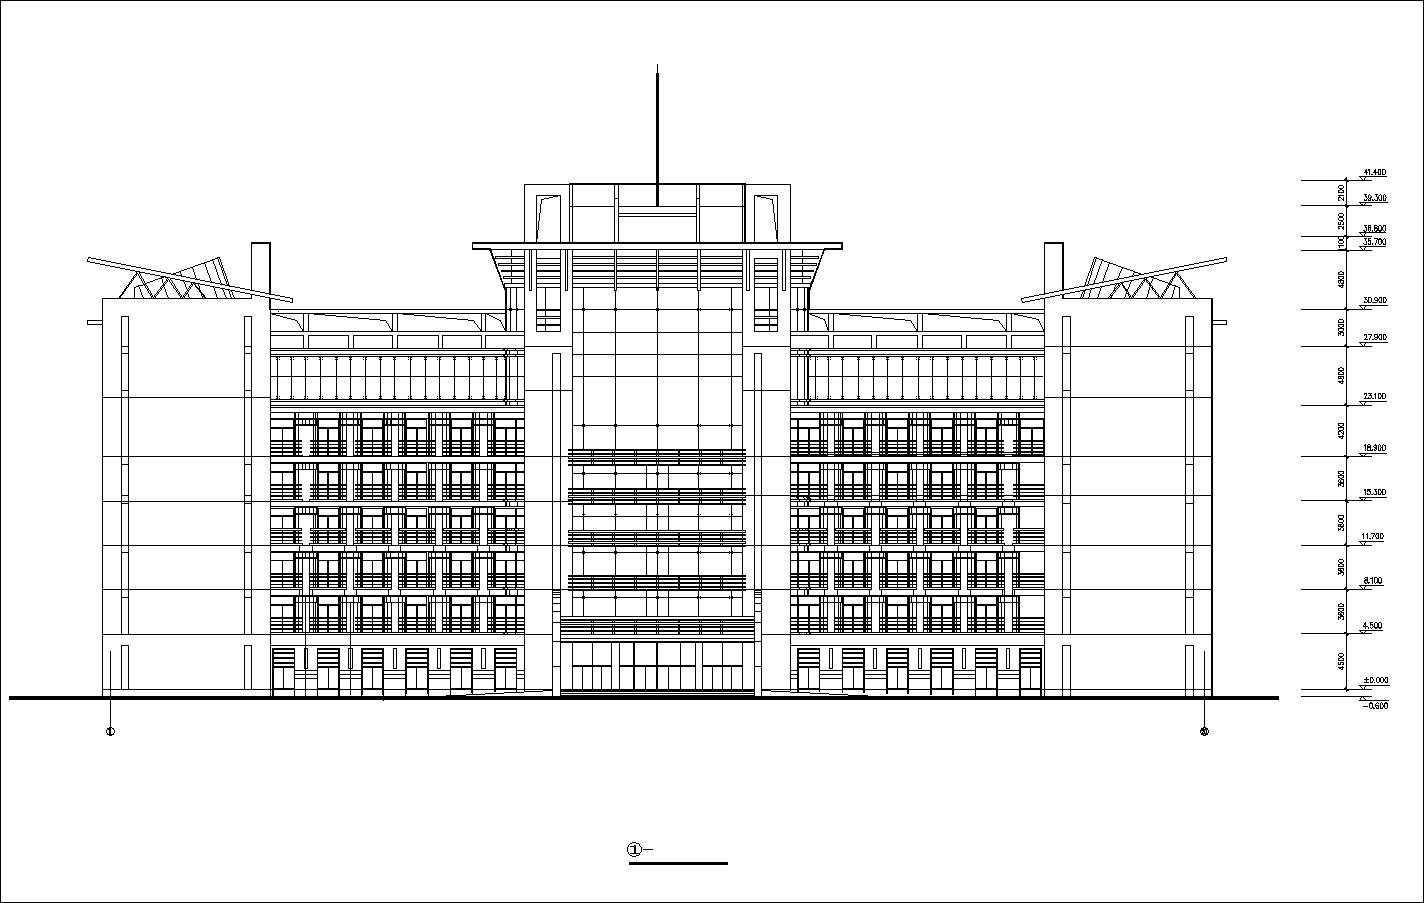 Hospital Cad Drawings Download Cad Blocks Drawings